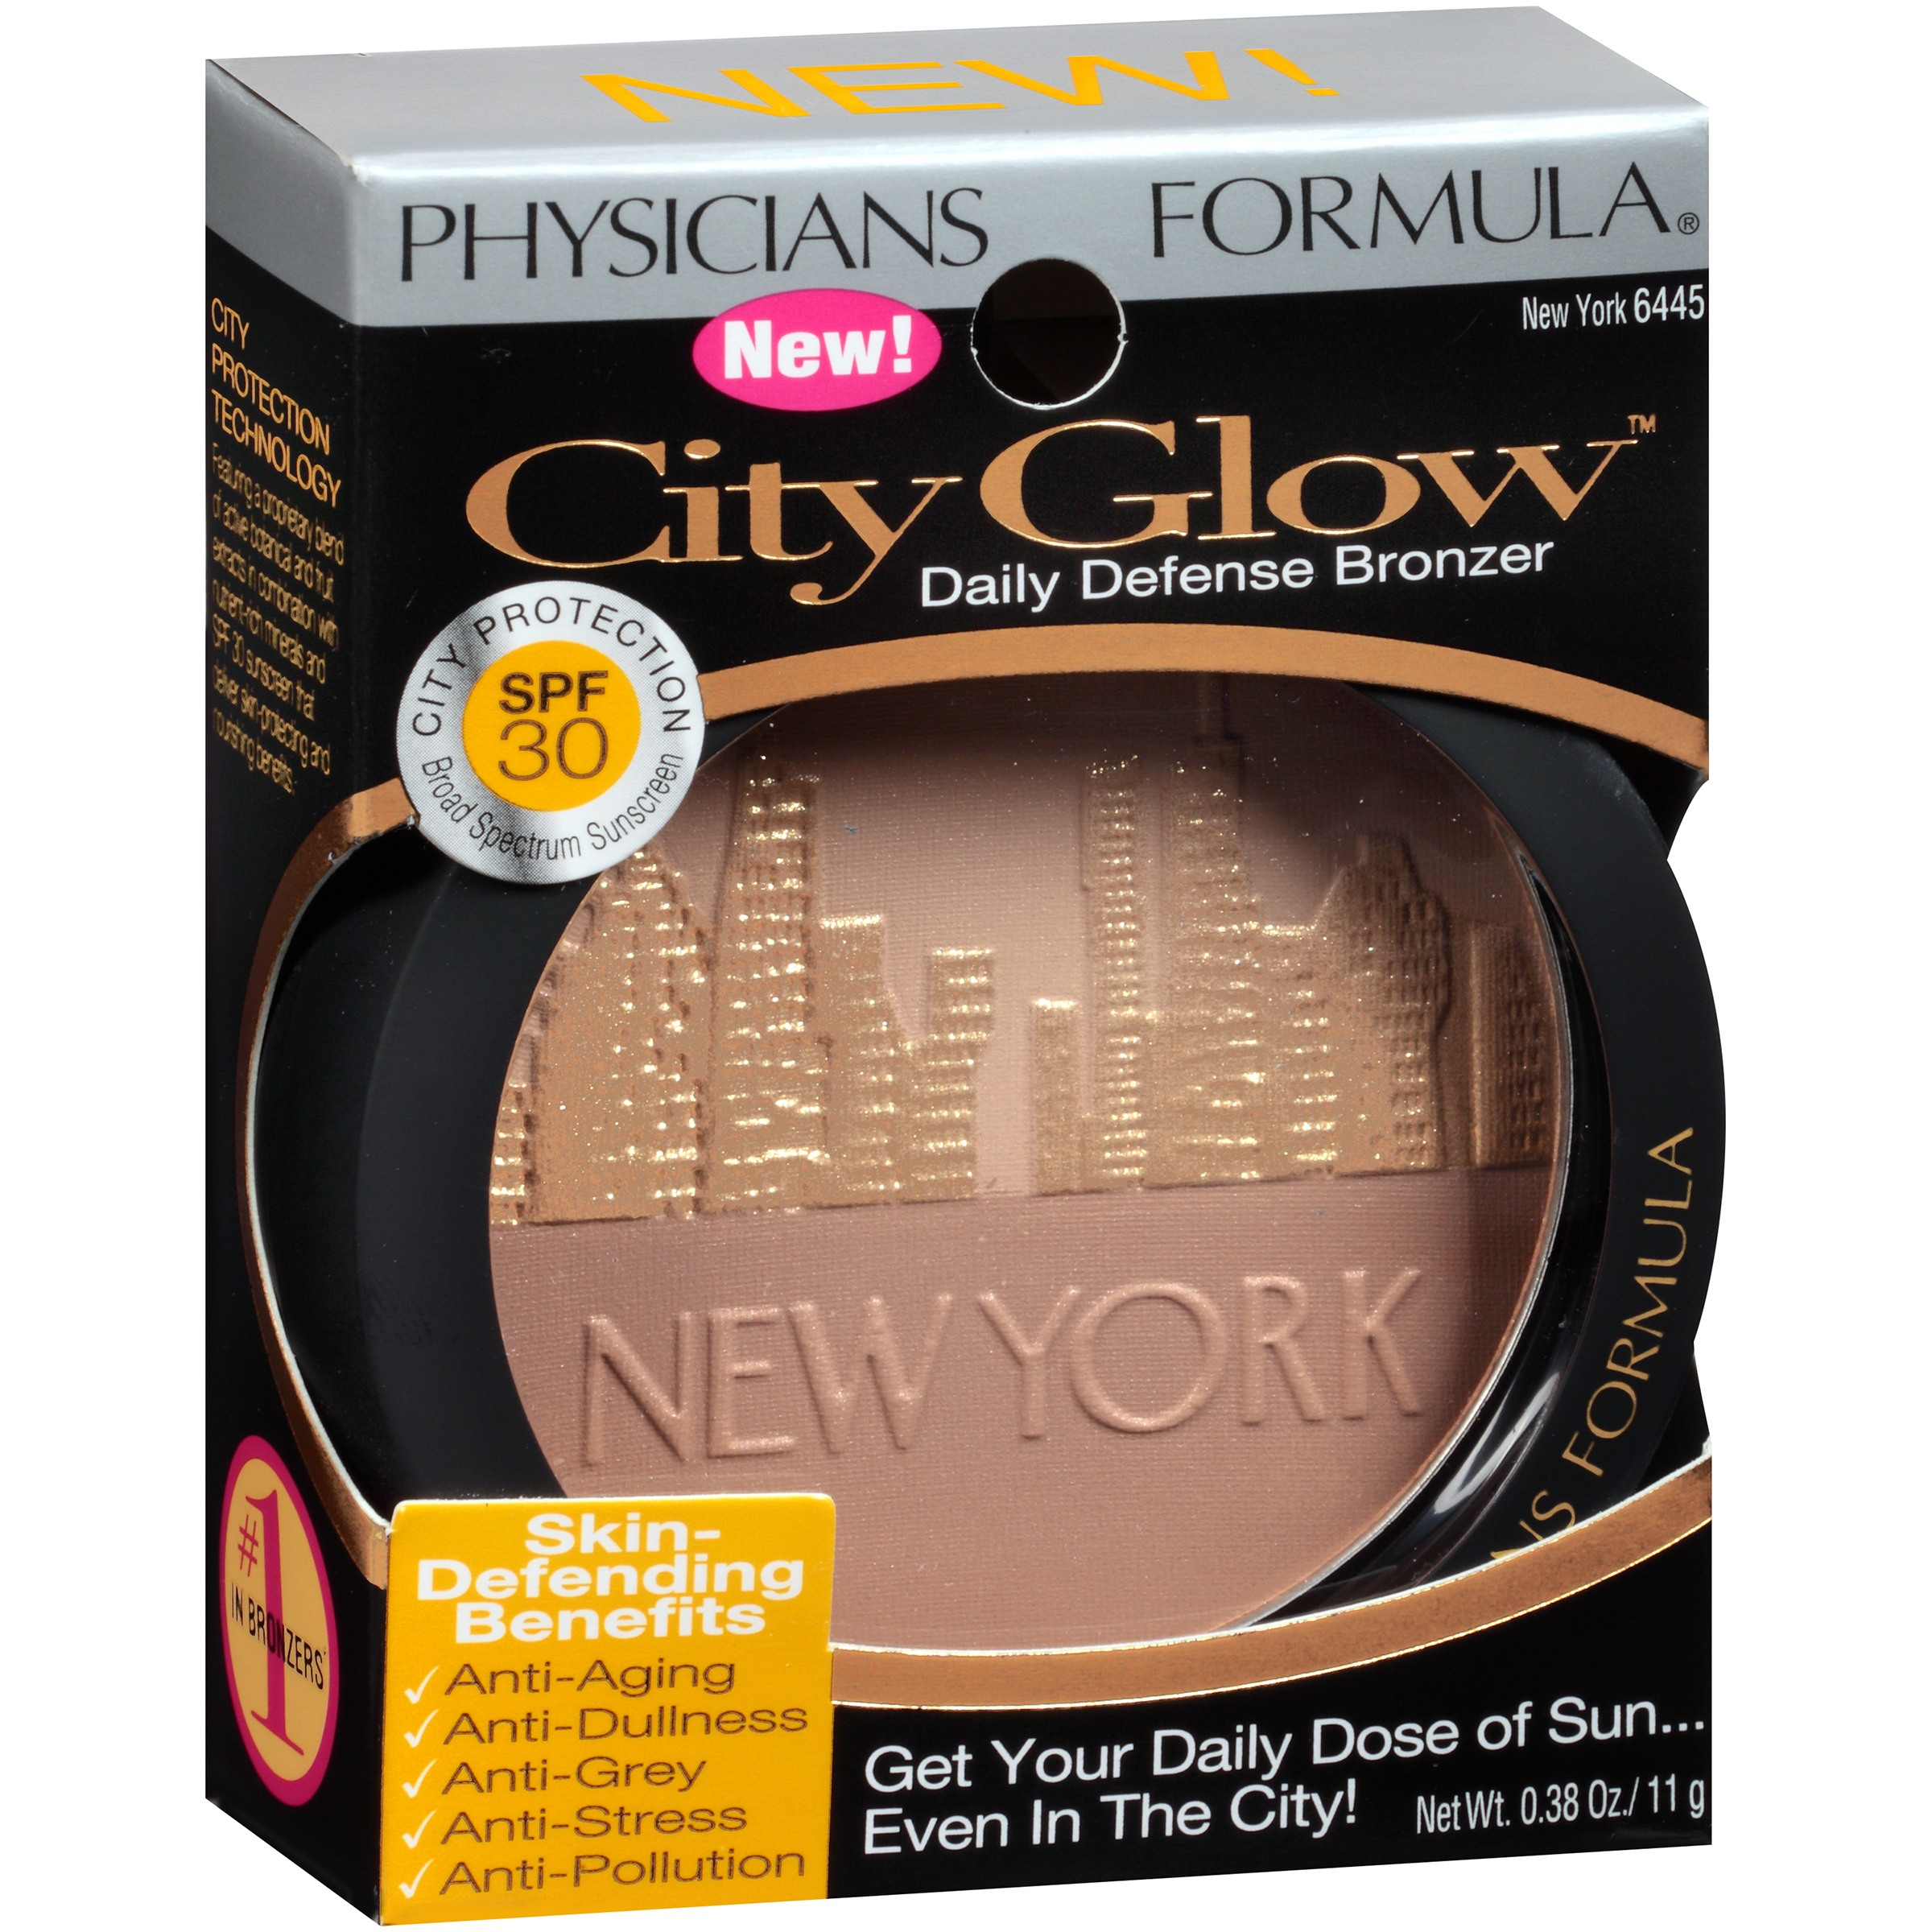 Physicians Formula City Glow 2 Bronzer 6445 New York .38 oz. Box